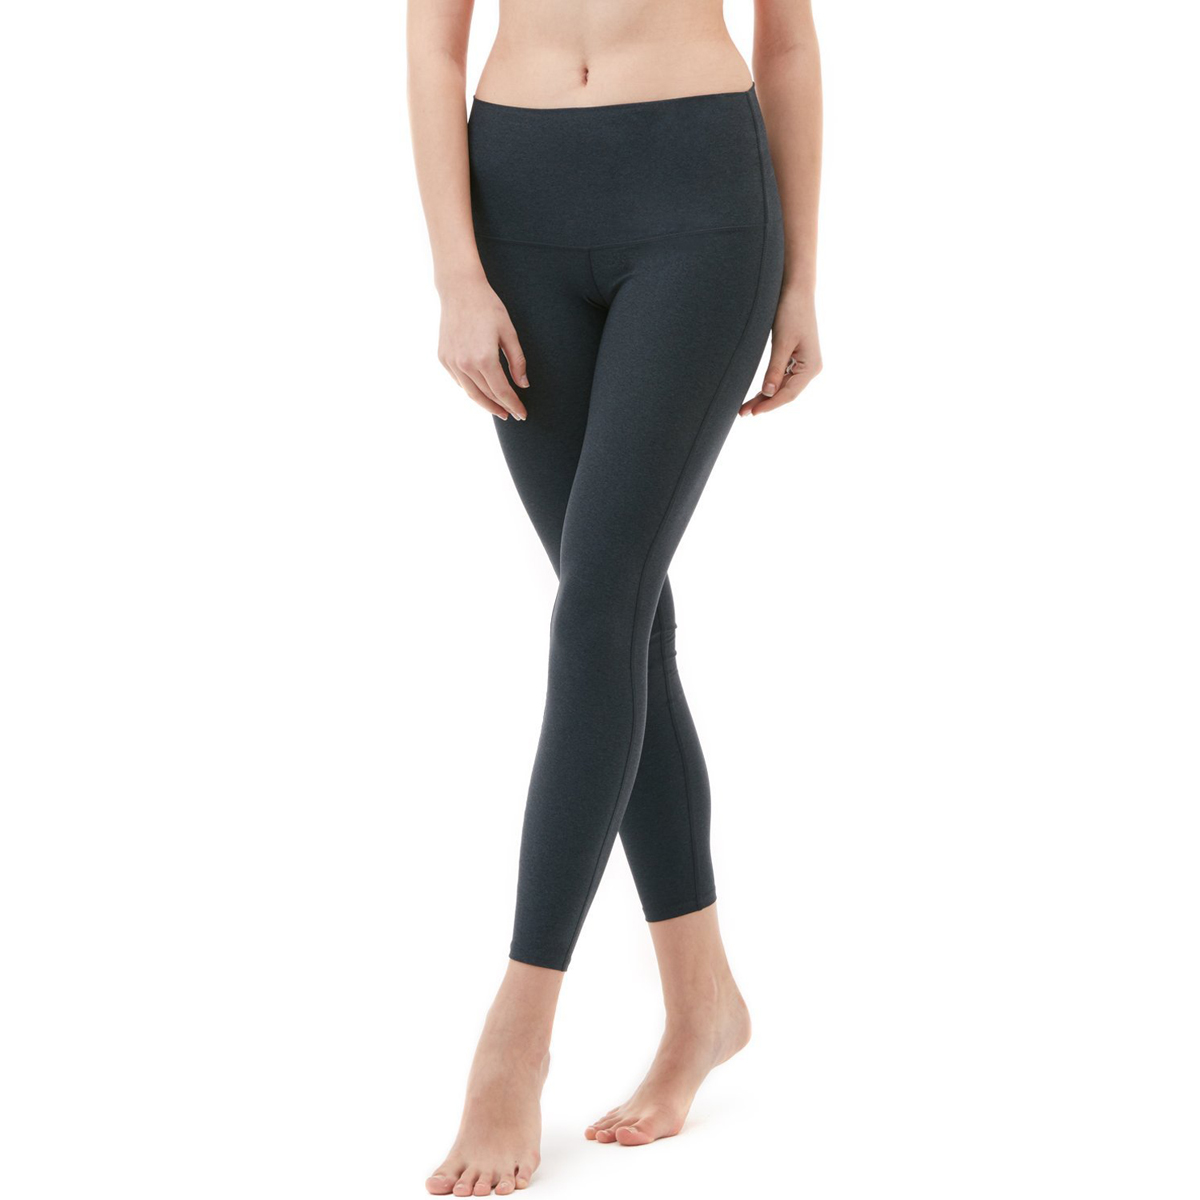 thumbnail 12 - TSLA Tesla FYP42 Women's High-Waisted Ultra-Stretch Tummy Control Yoga Pants